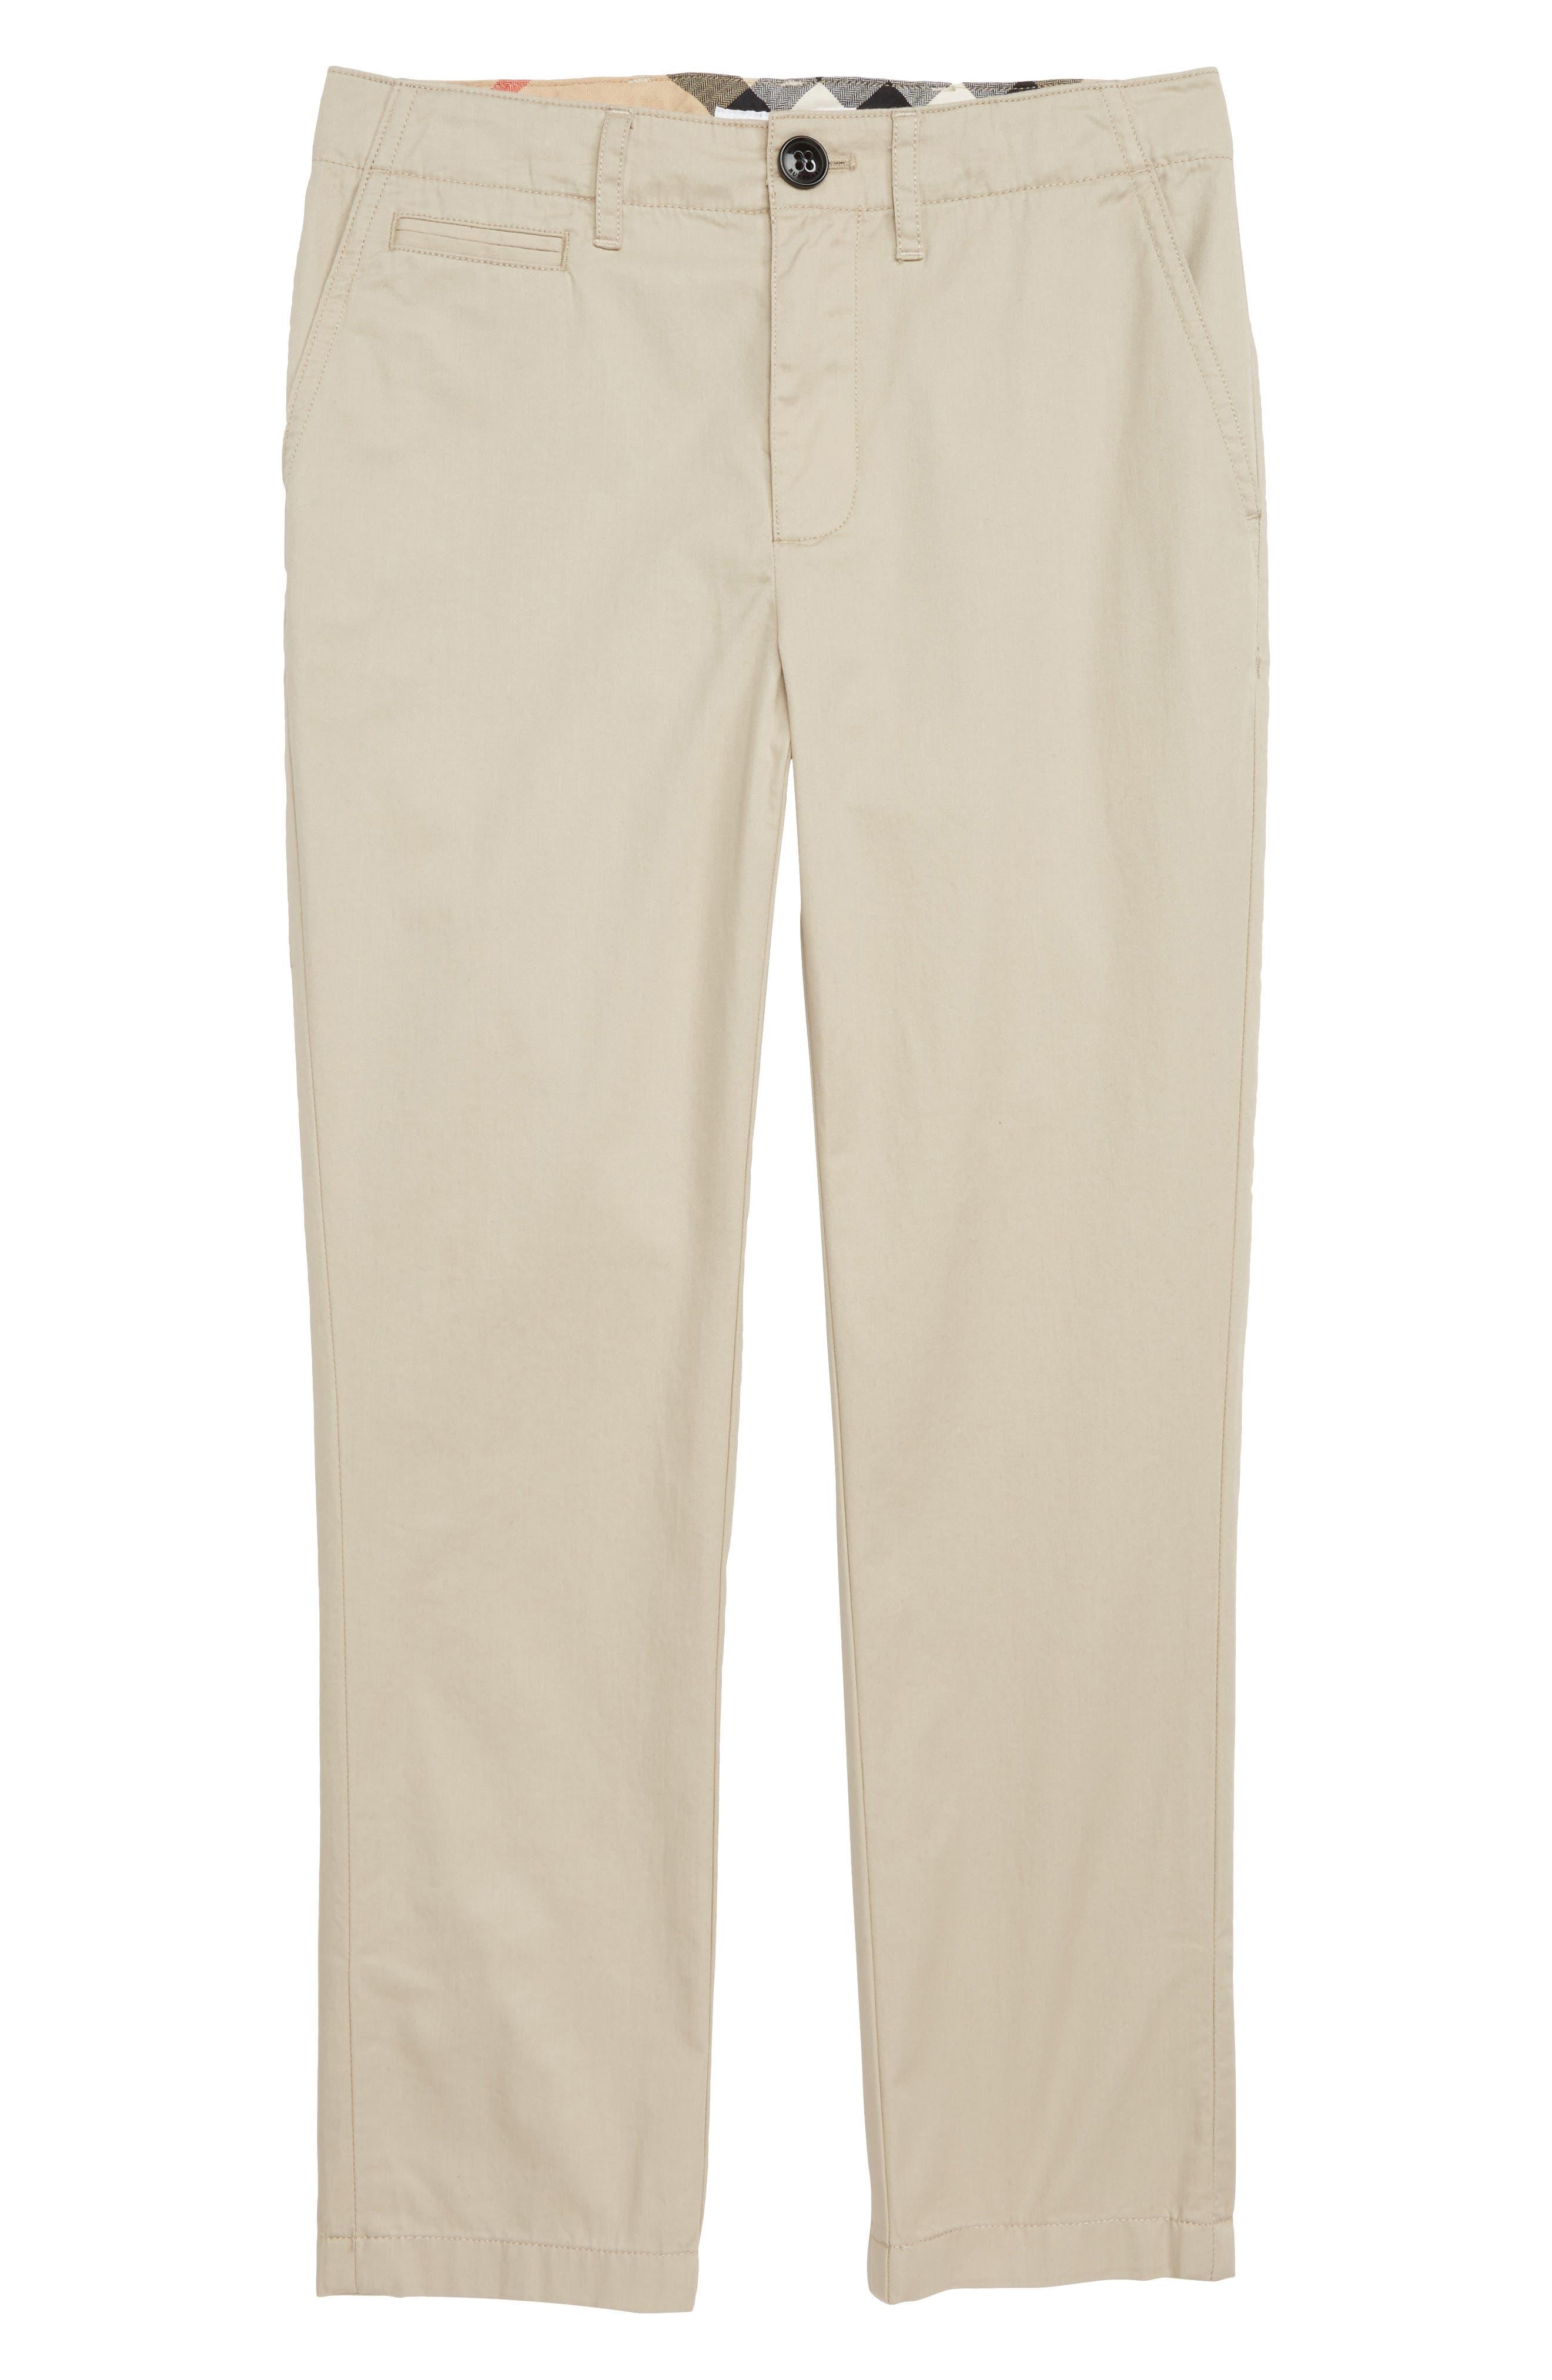 Kids Teo Trousers,                             Main thumbnail 1, color,                             GREY STONE